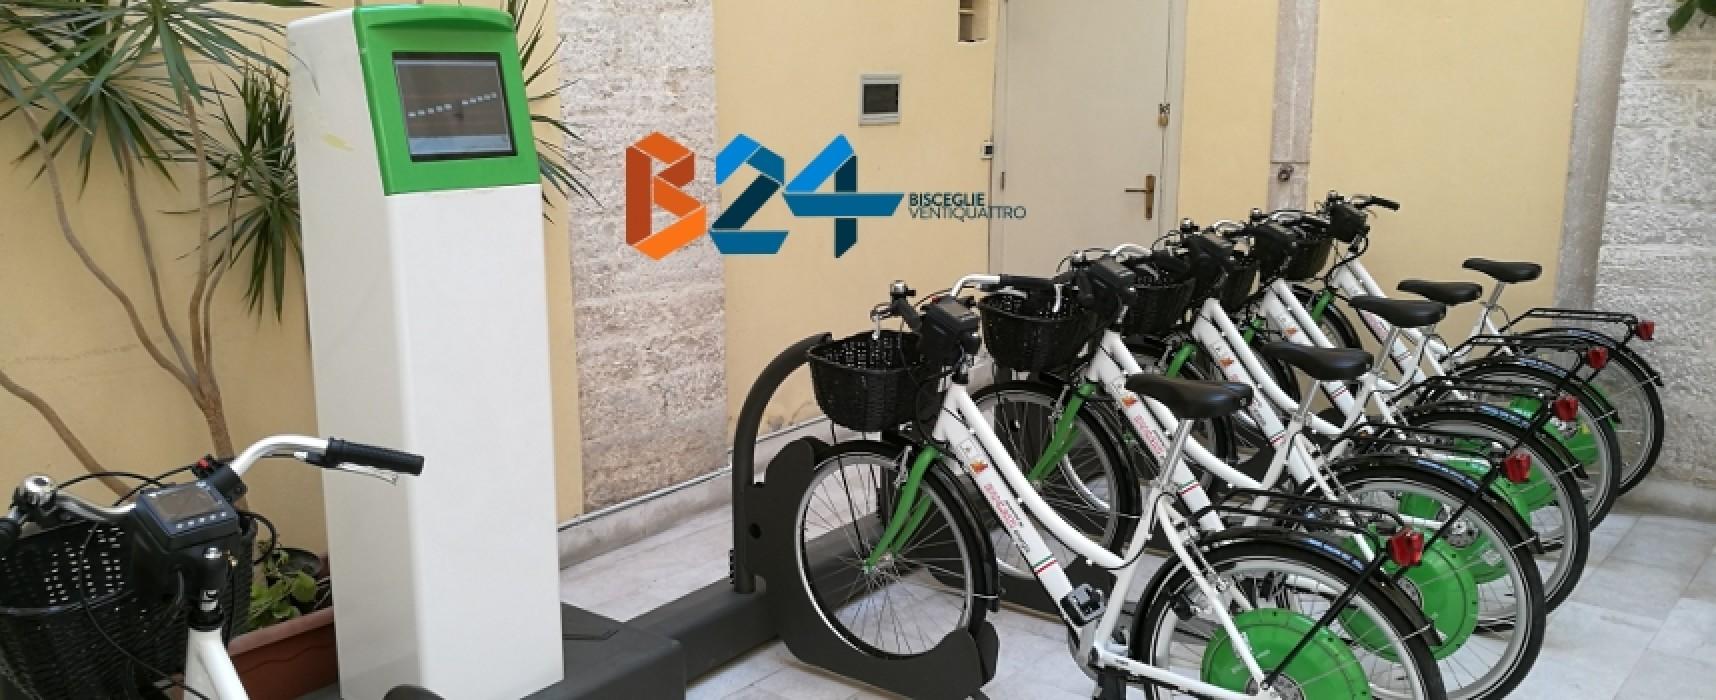 Consegnate in comune dieci e-bike 0, le biciclette a pedalata assistita di ultima generazione /FOTO